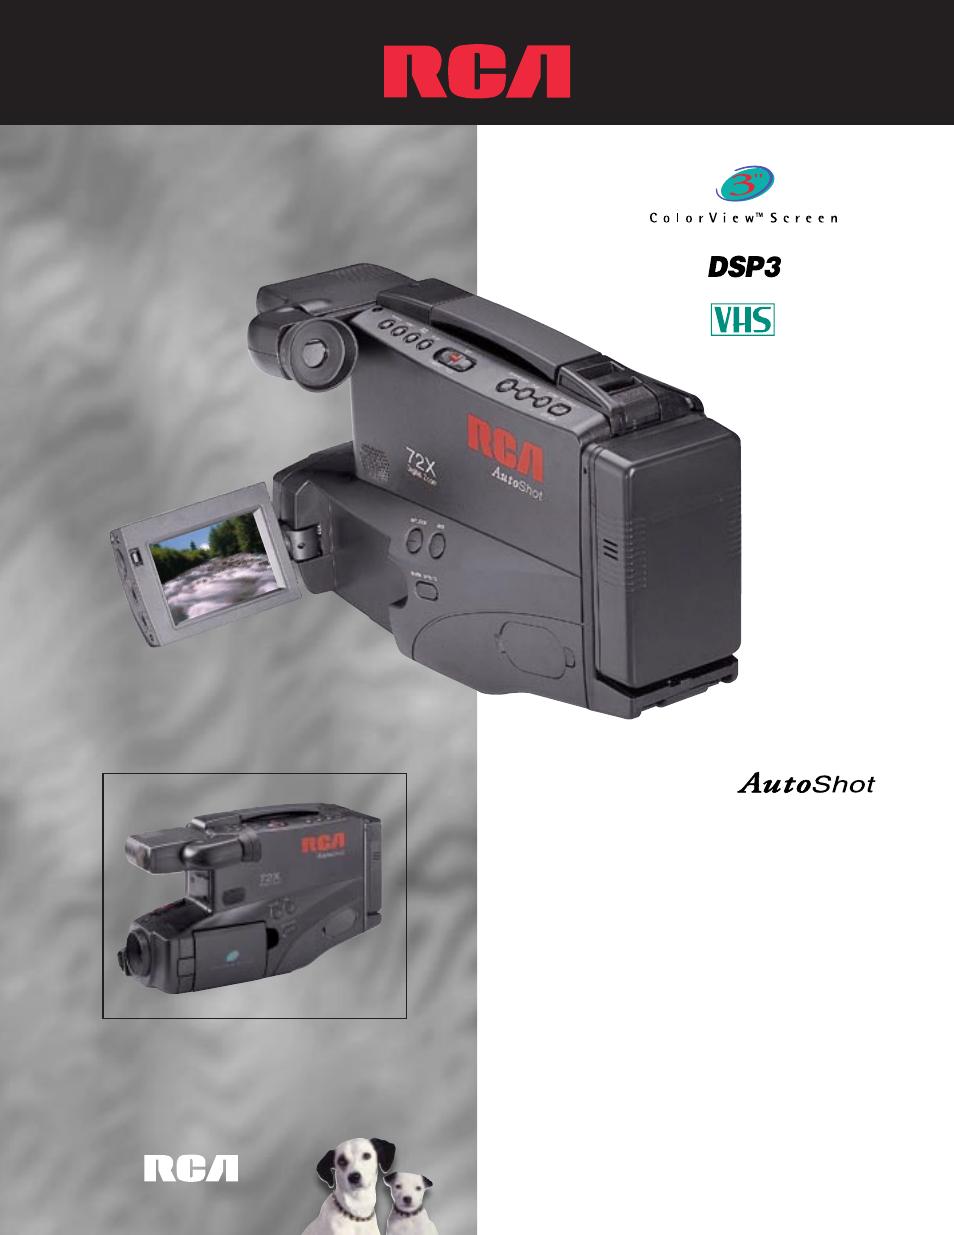 rca cc4352 user manual 2 pages rh manualsdir com RCA Small Wonder Digital Camcorder RCA Camcorder VHS Case